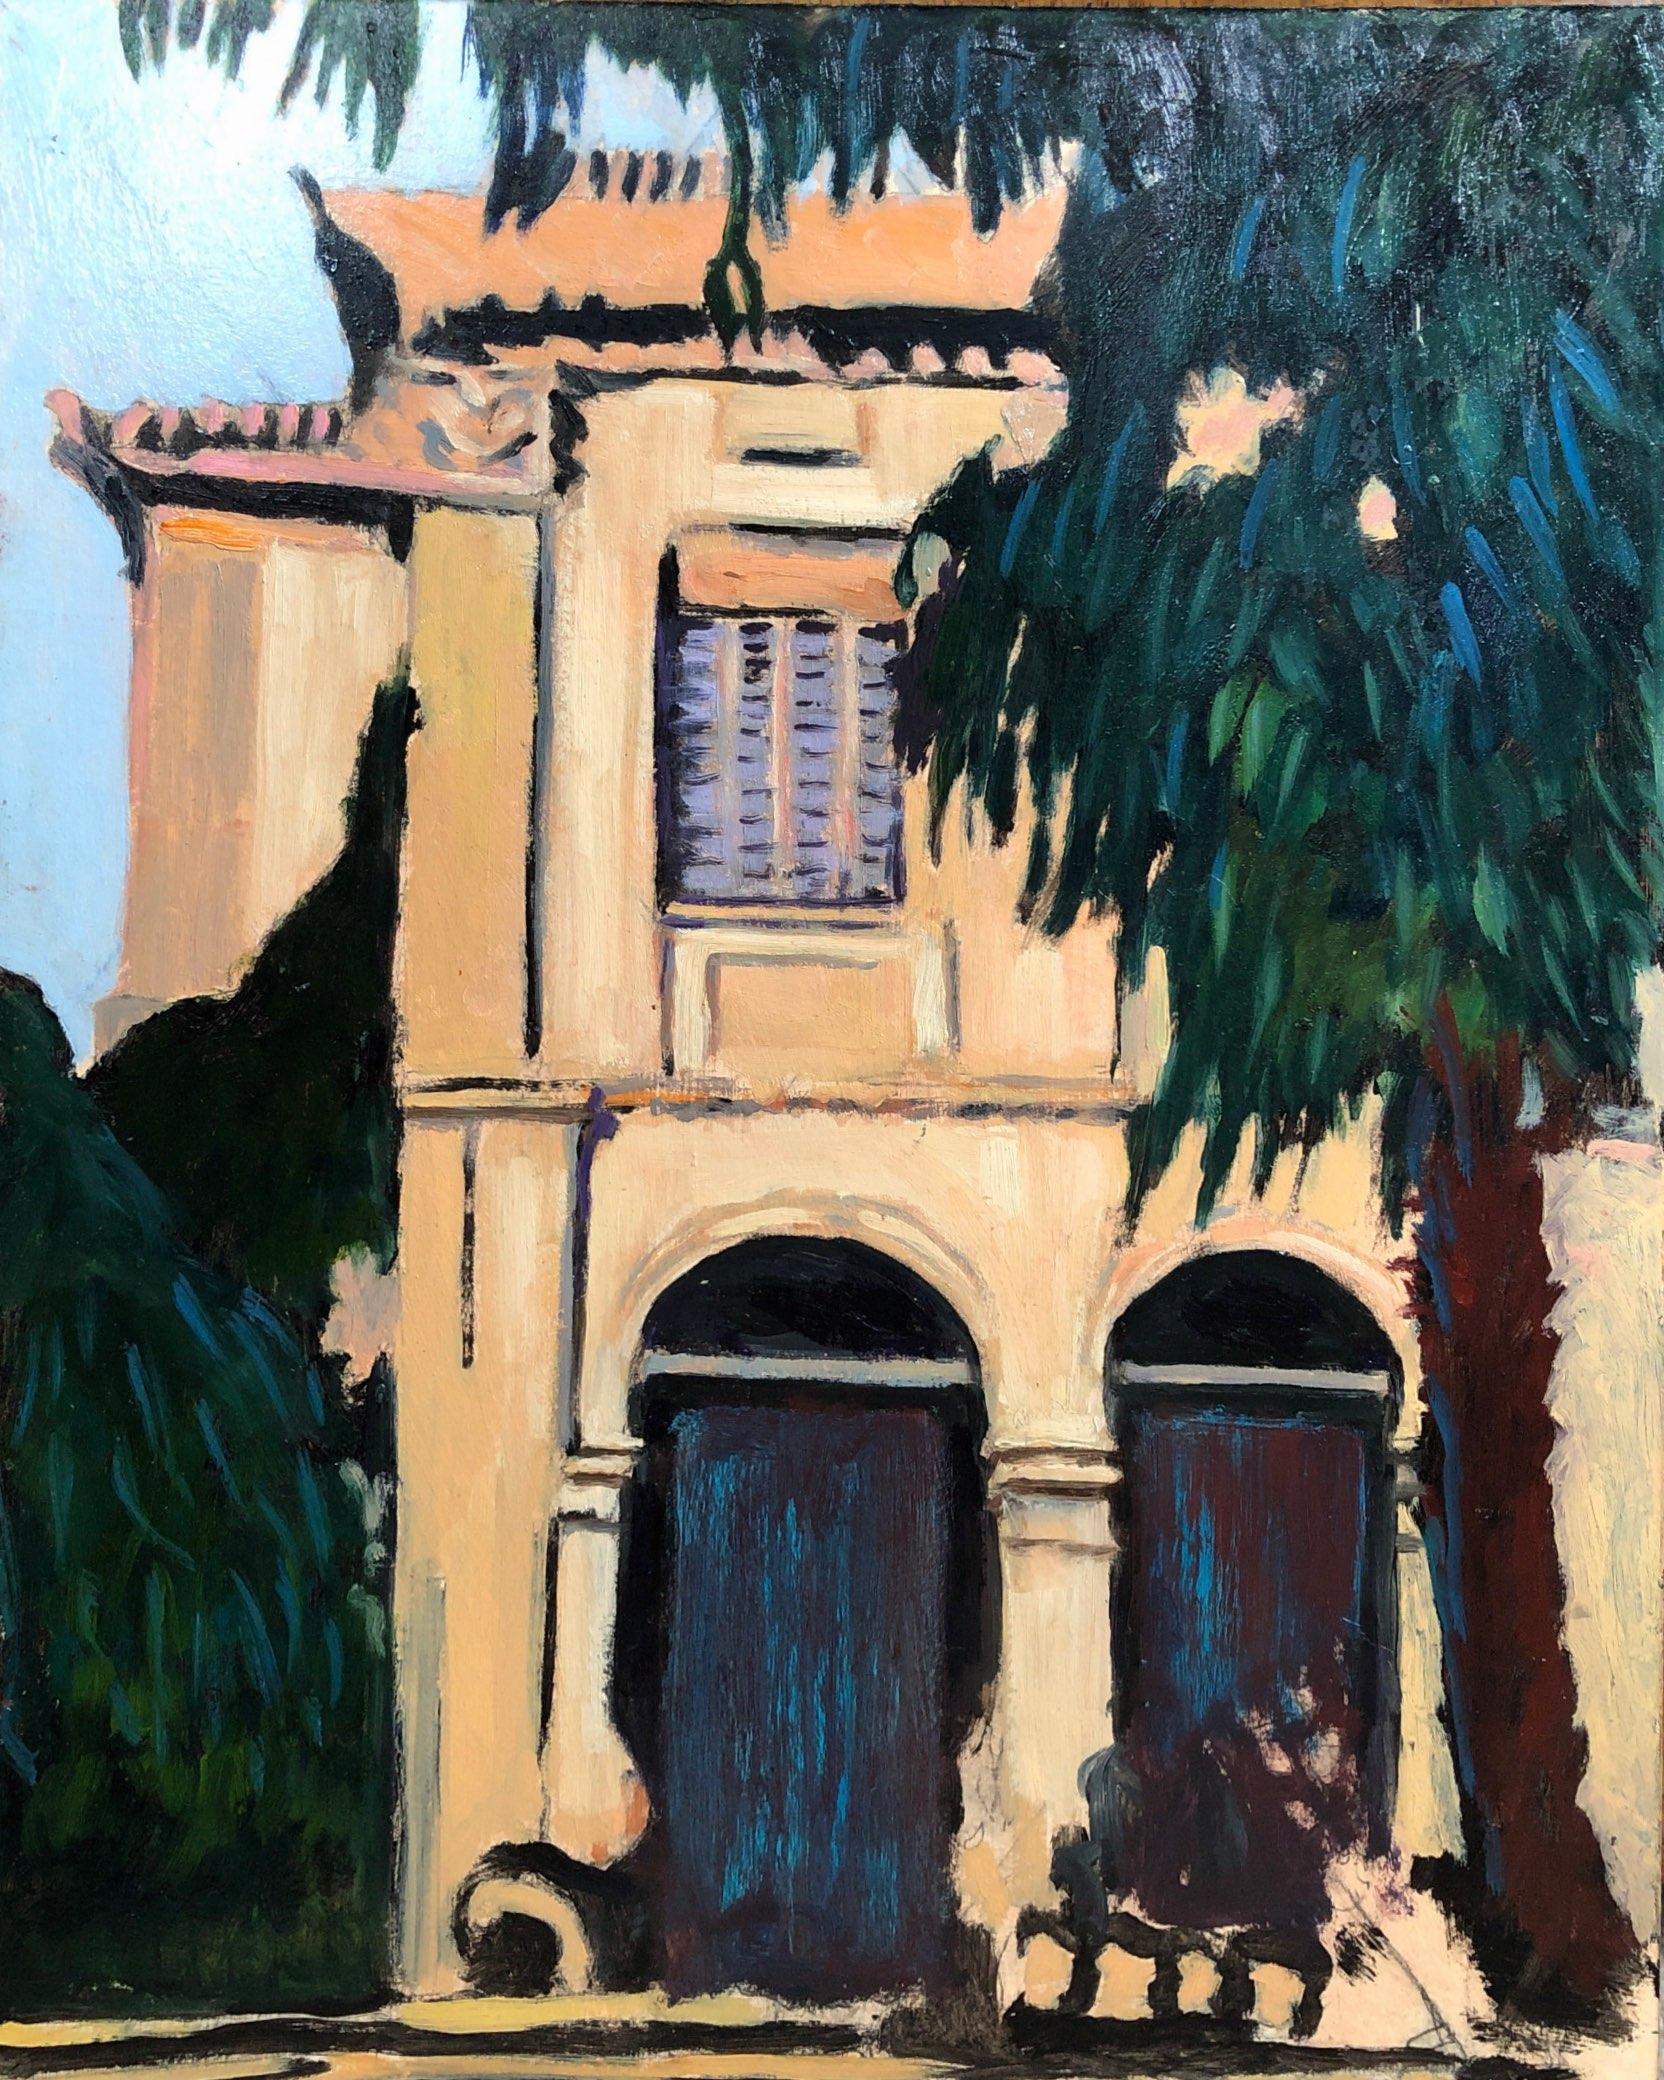 The Venetian house 34x45 oil